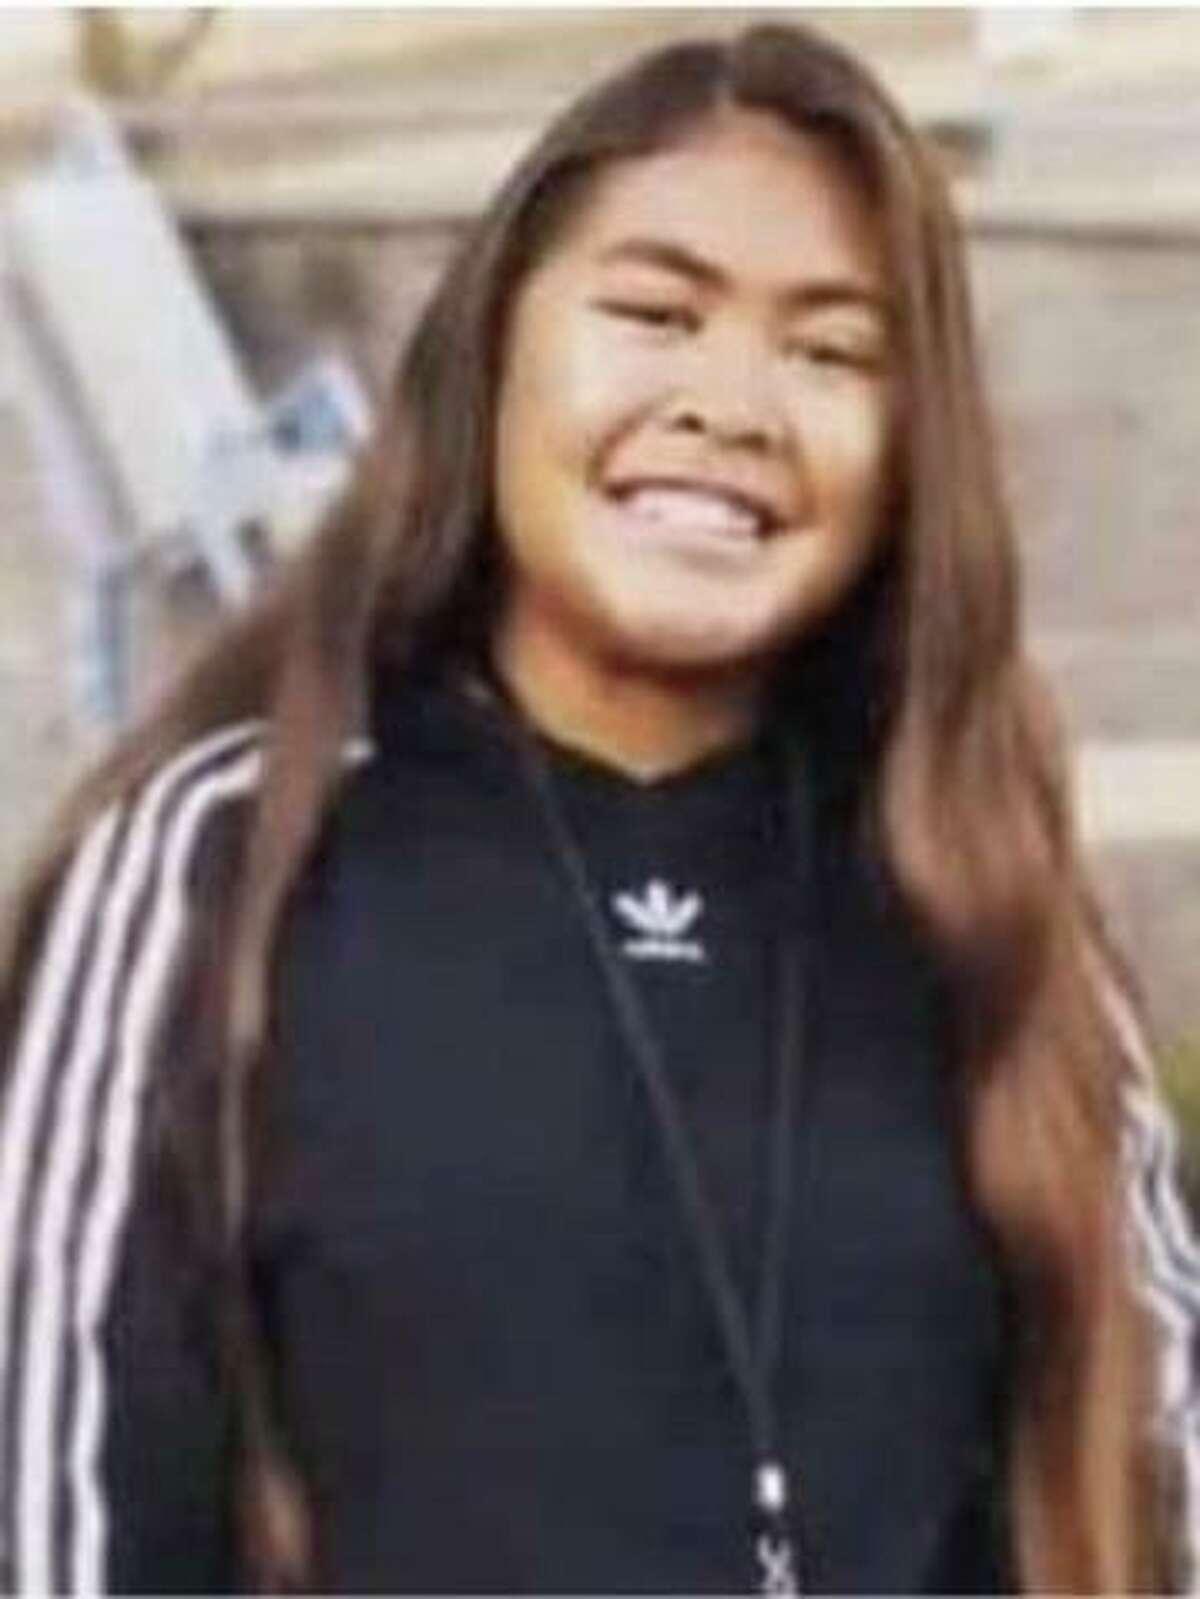 Jaedah Tofaeono was fatally shot on July 30 in San Francisco's Bayview neighborhood.